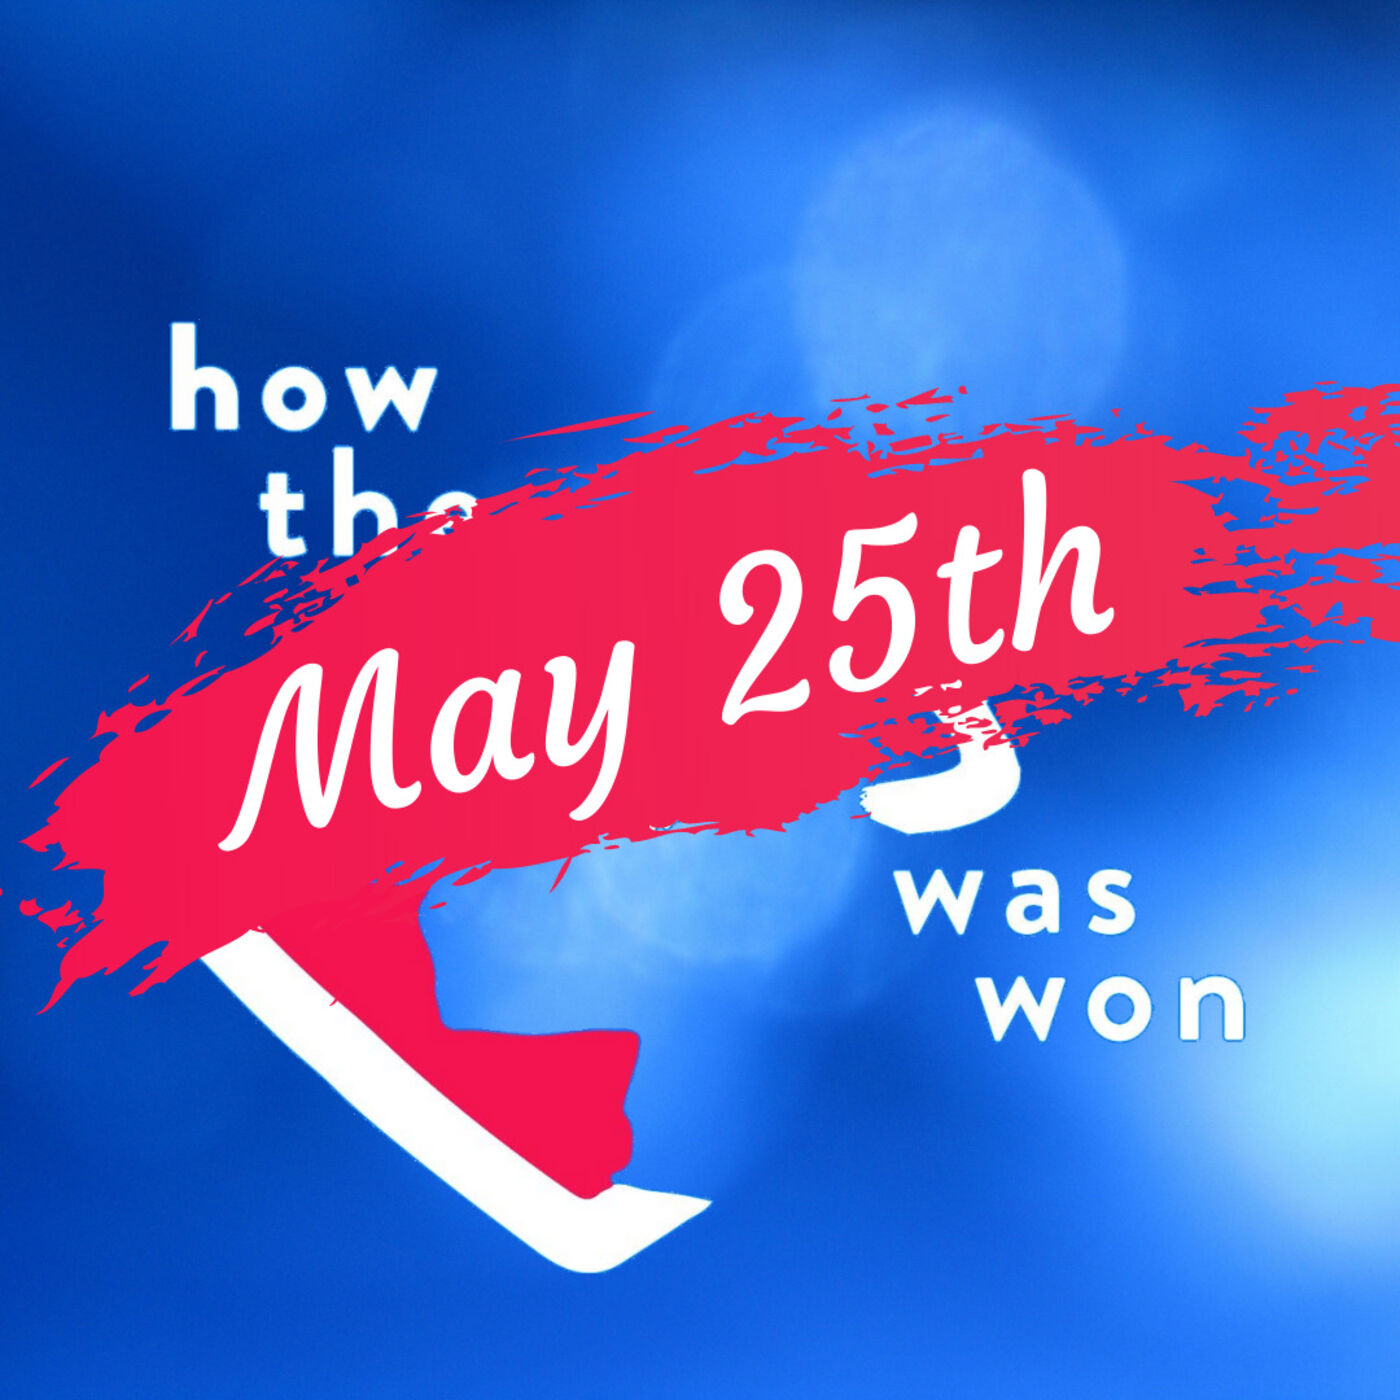 Launching May 25th